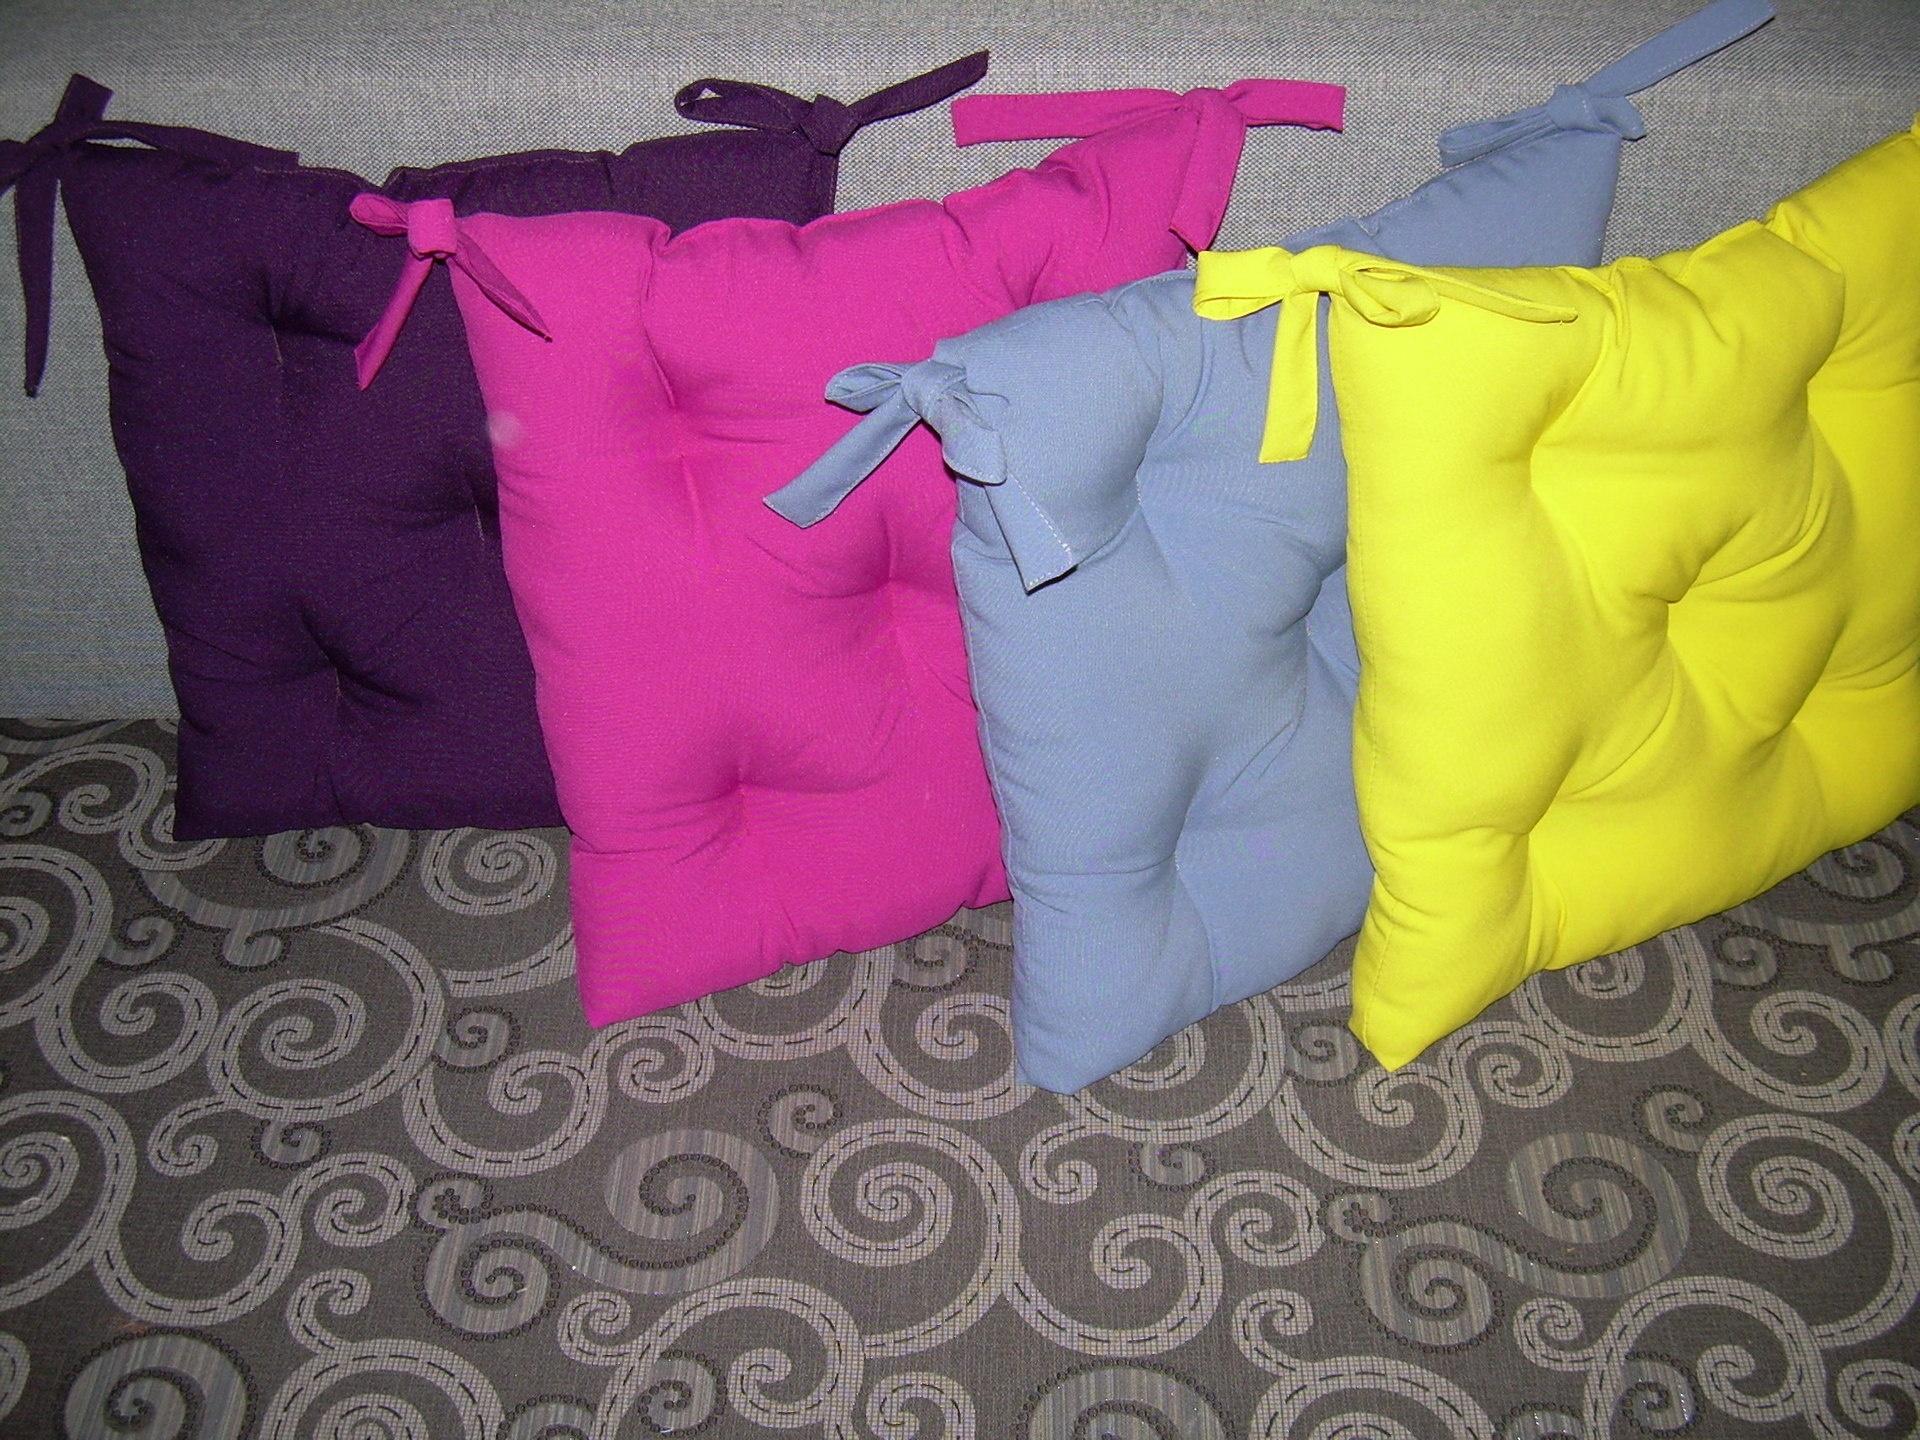 Подушка на стул своими руками выкройка